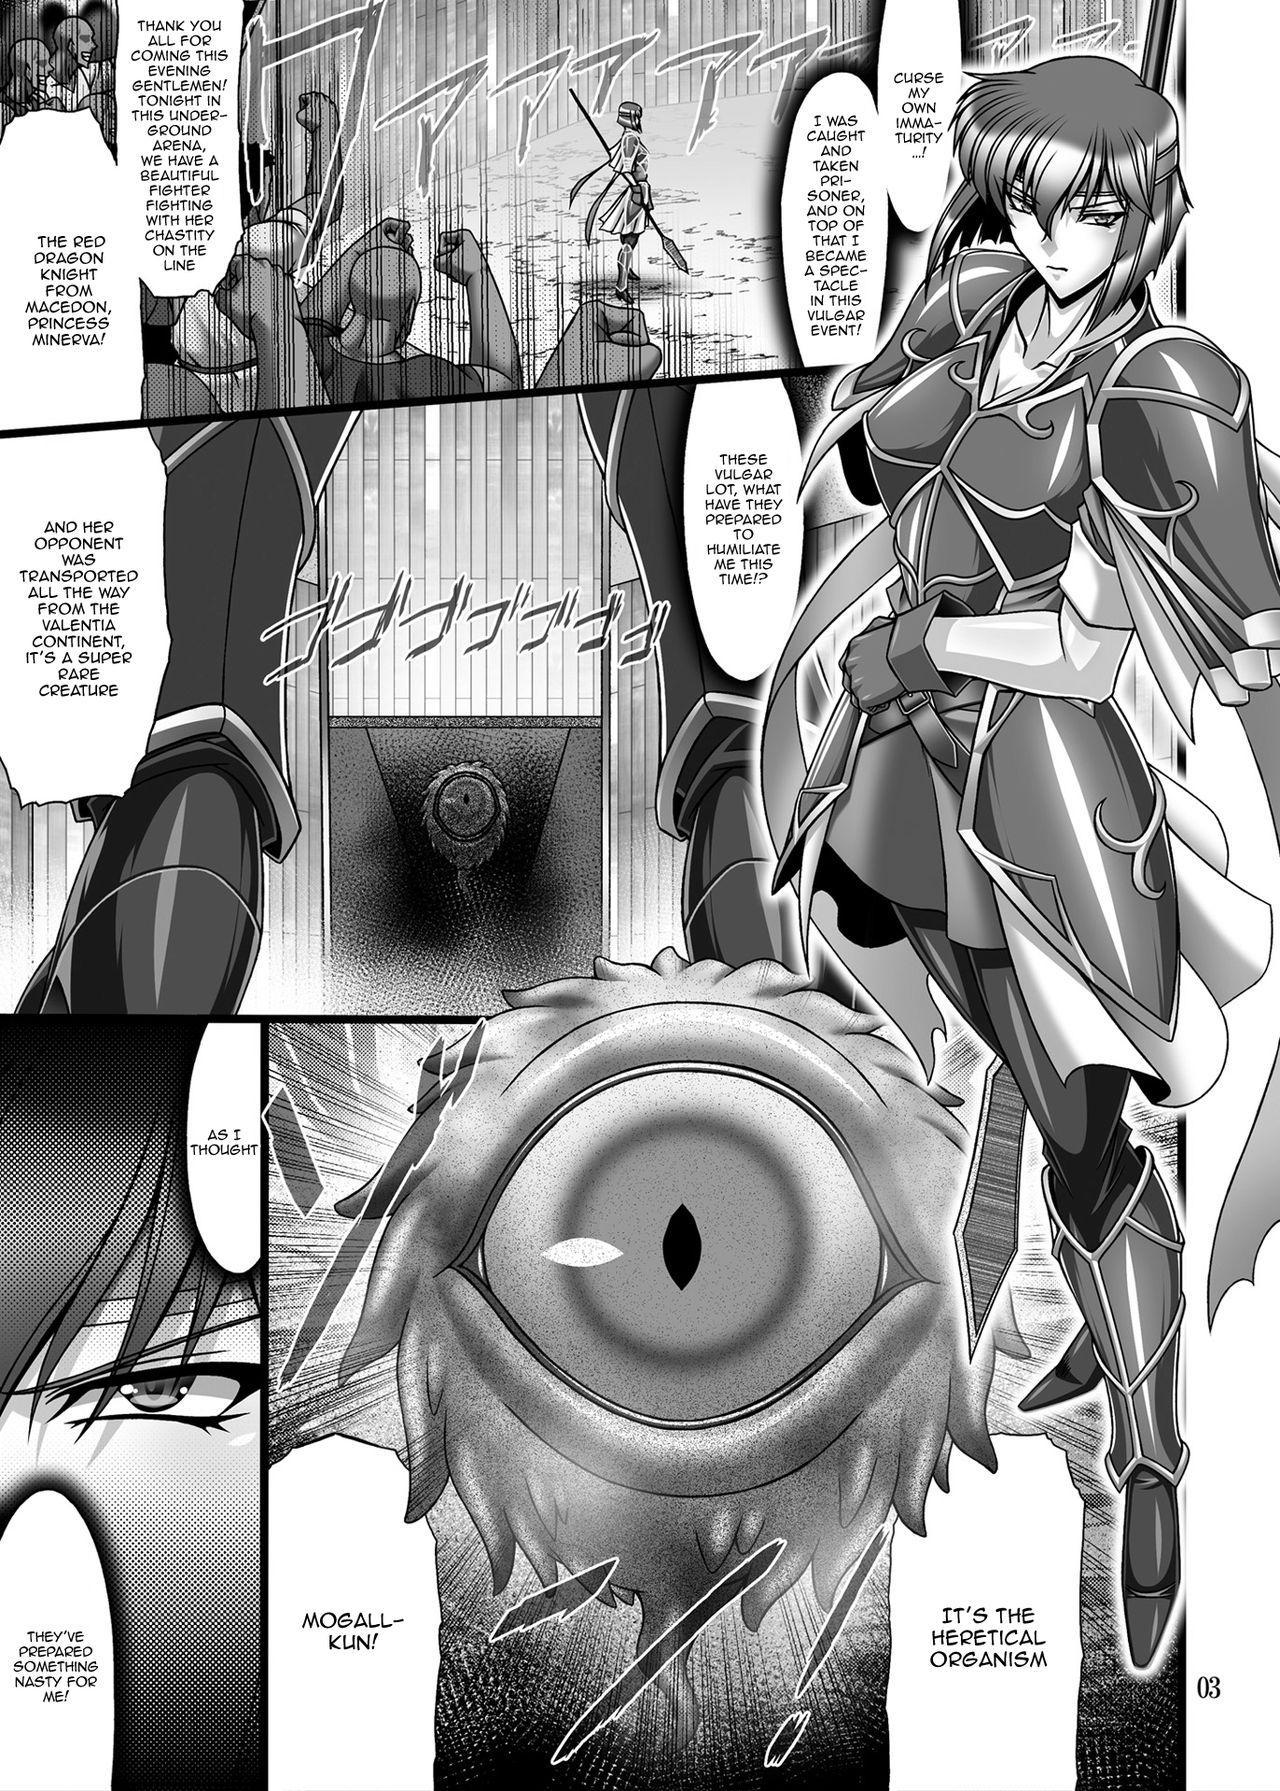 Oshi Chara Emblem | Favorite Emblem Characters 1